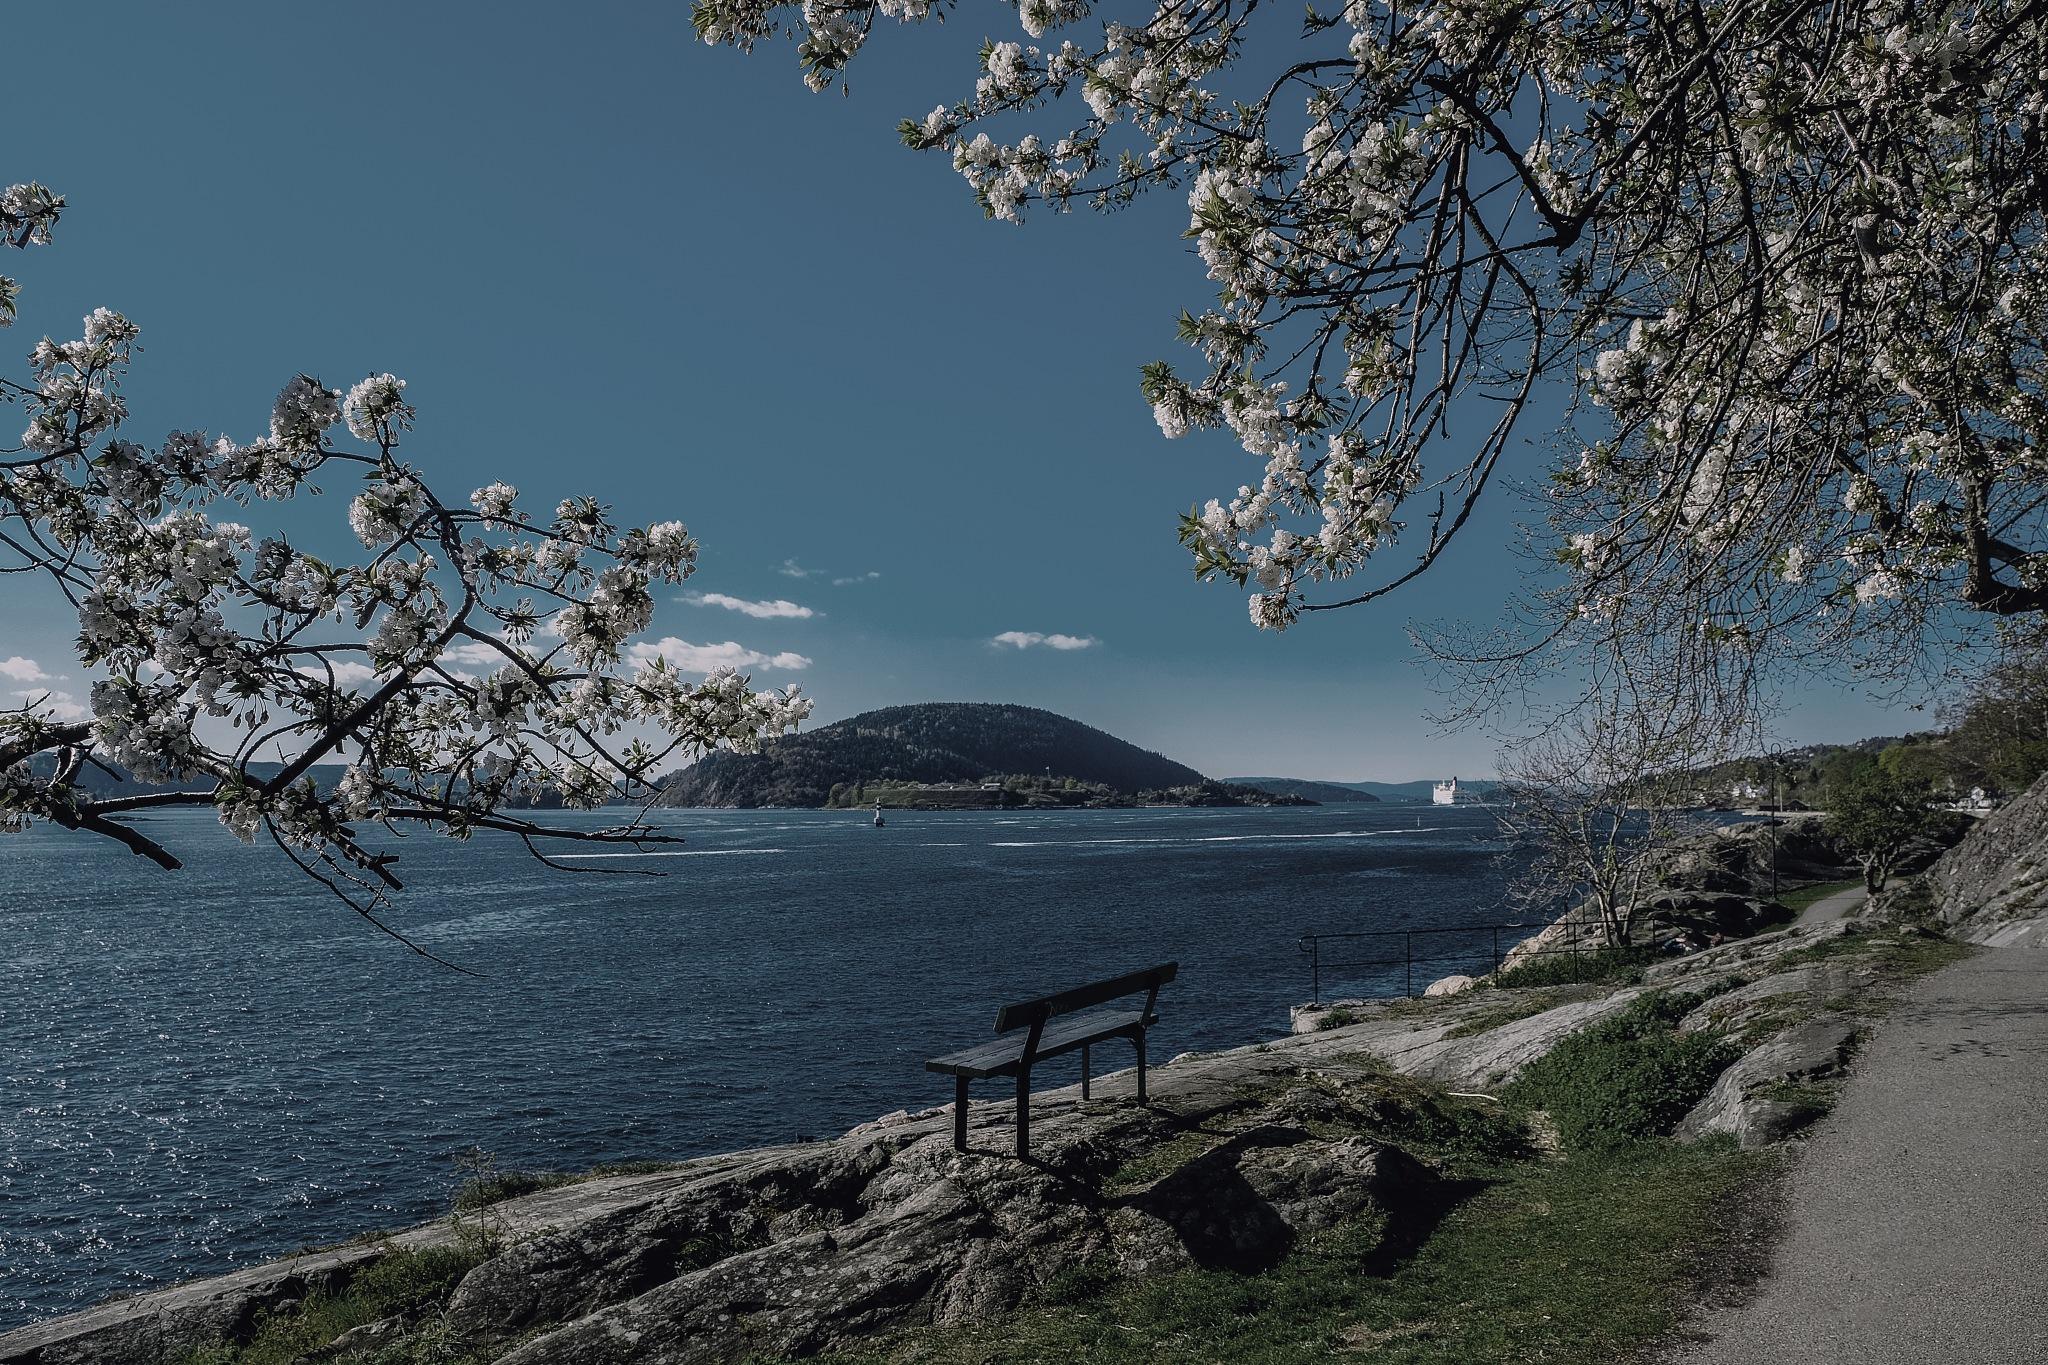 Spring at Oslo fjord by Goran Jorganovich